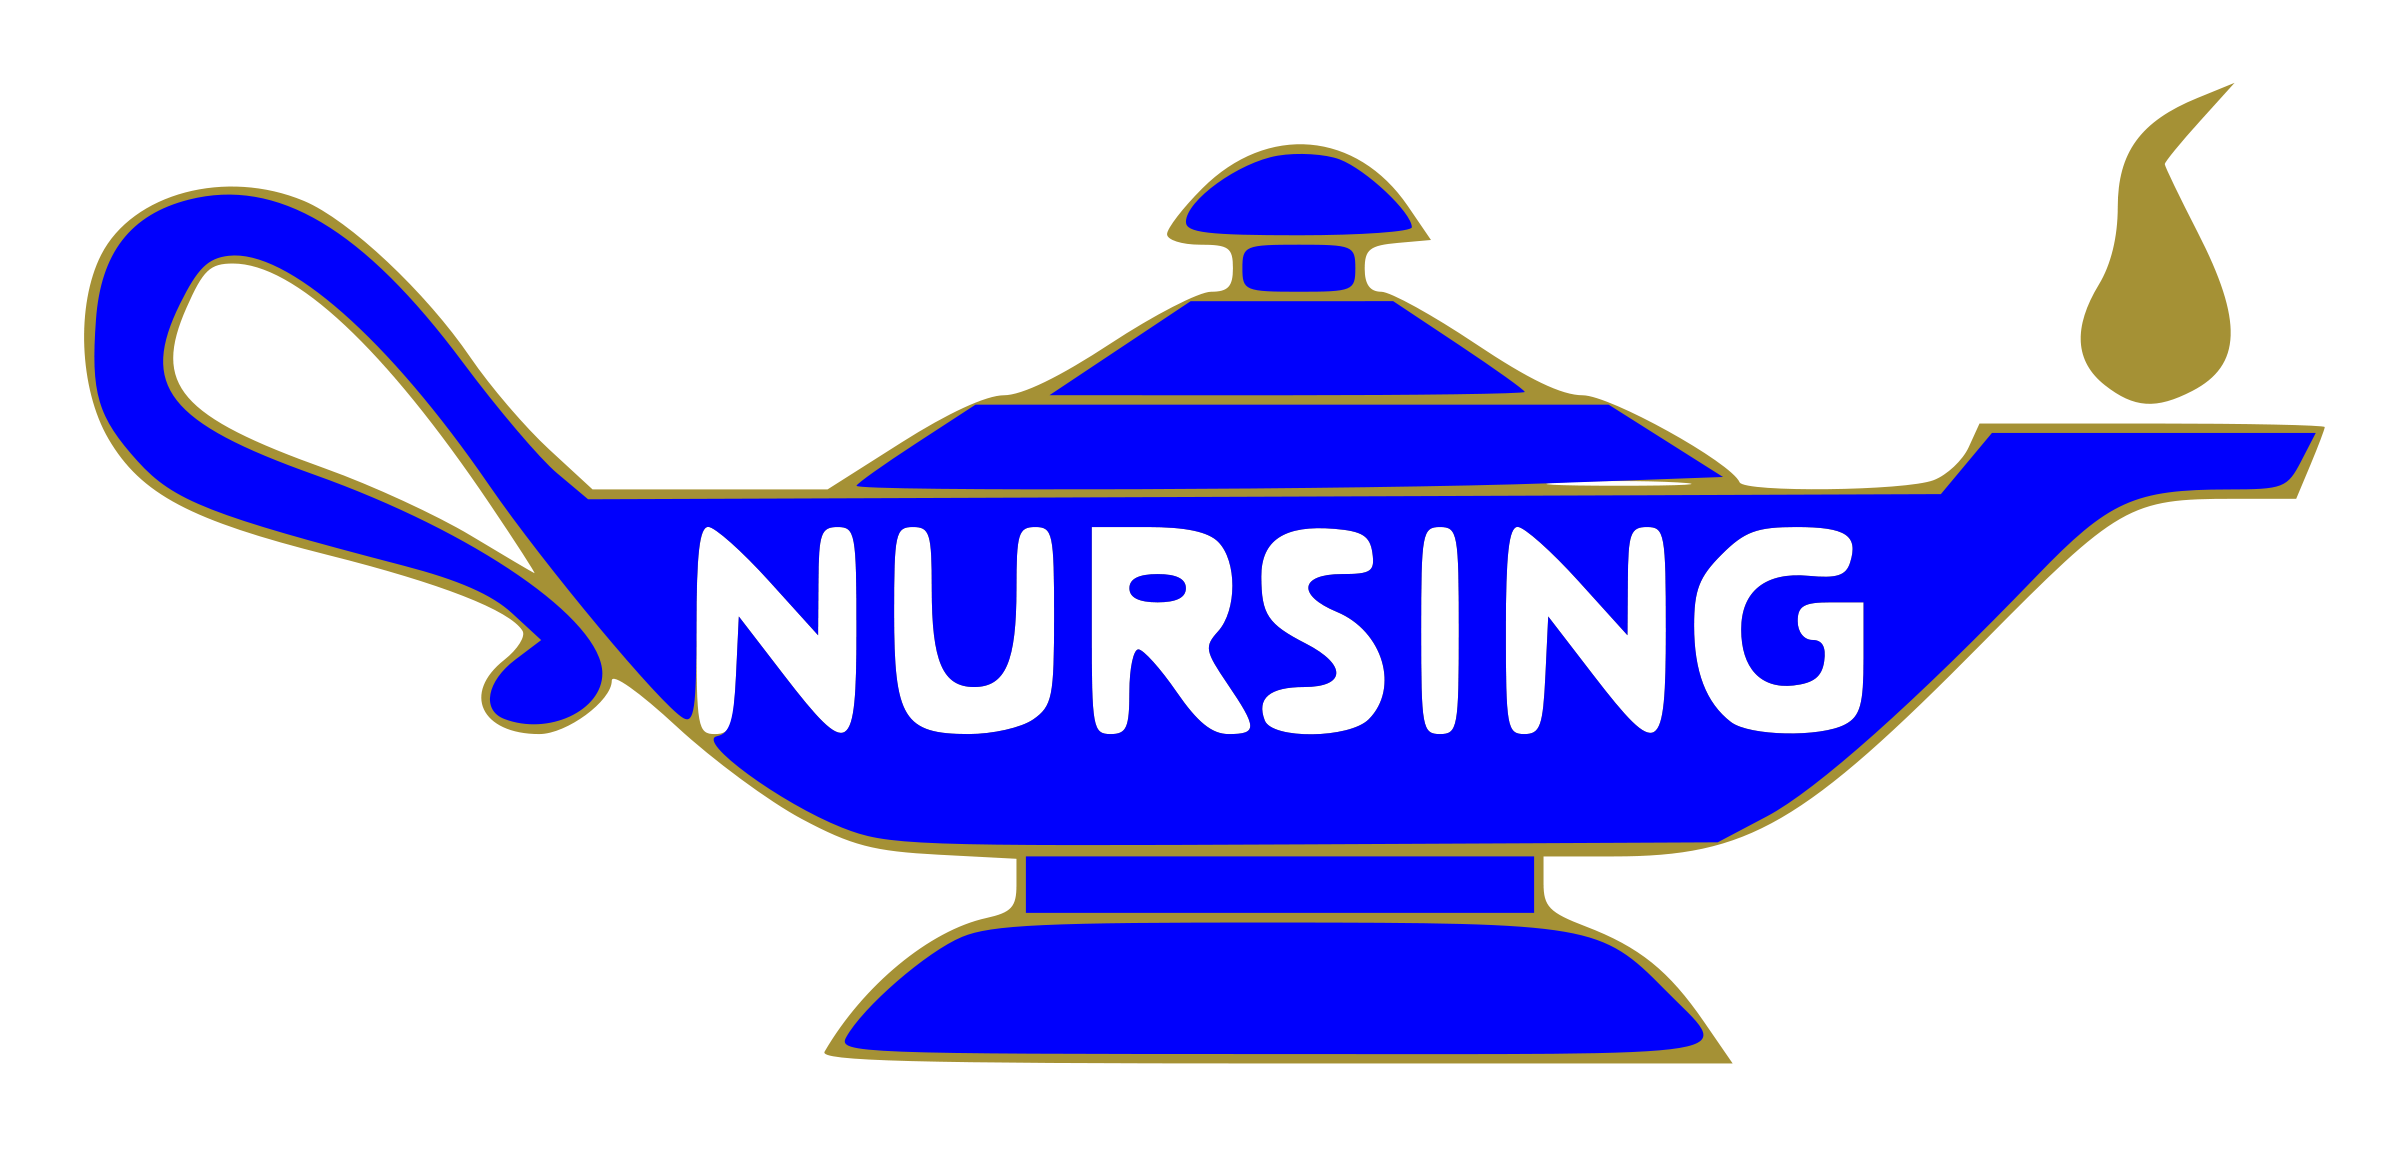 Nursing clipart nursing diagnosis. Free lamp cliparts download